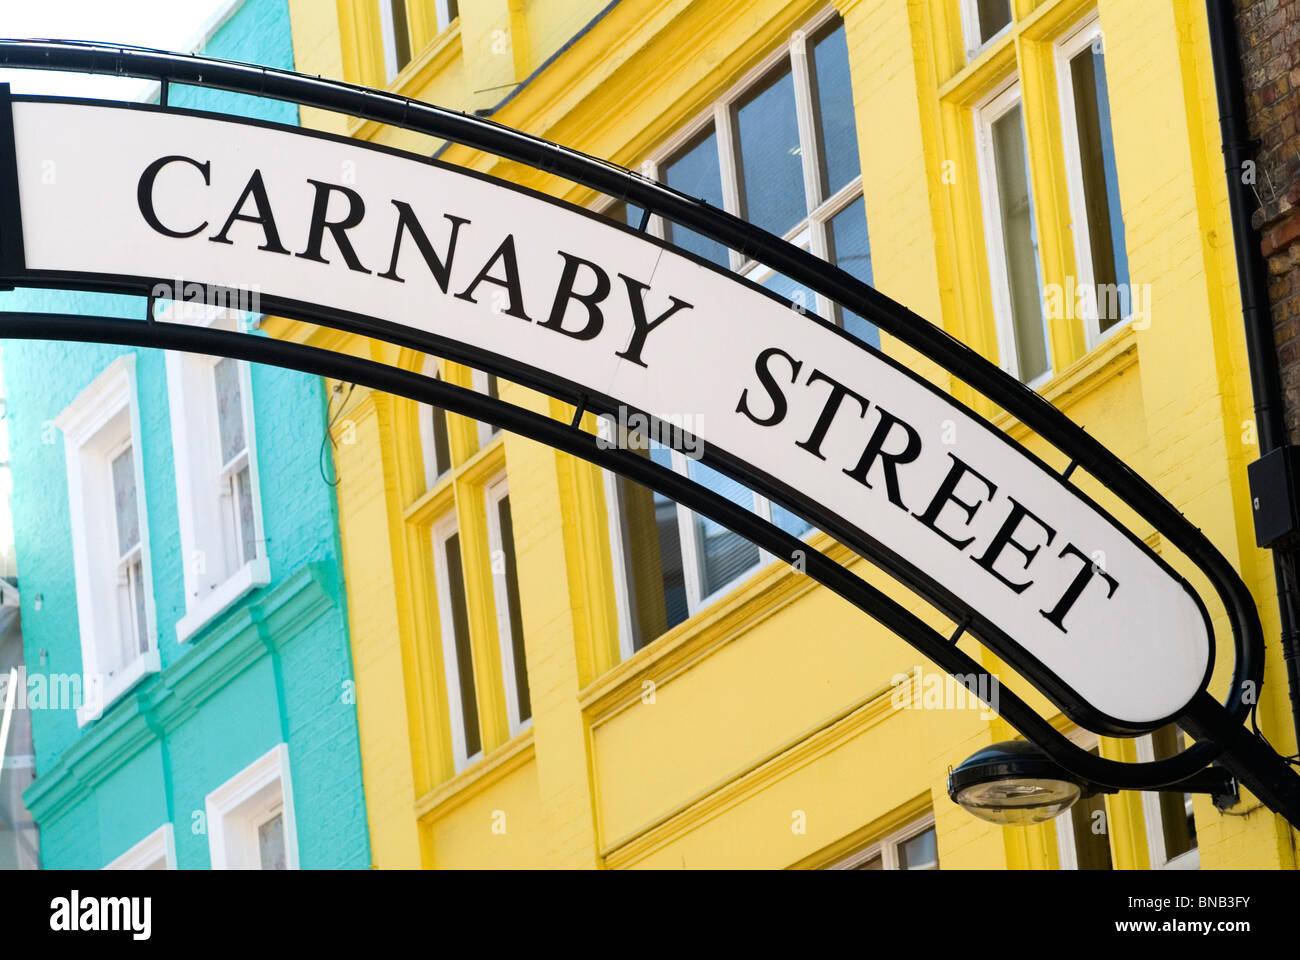 Carnaby Street. London W1 Uk.  HOMER SYKES - Stock Image